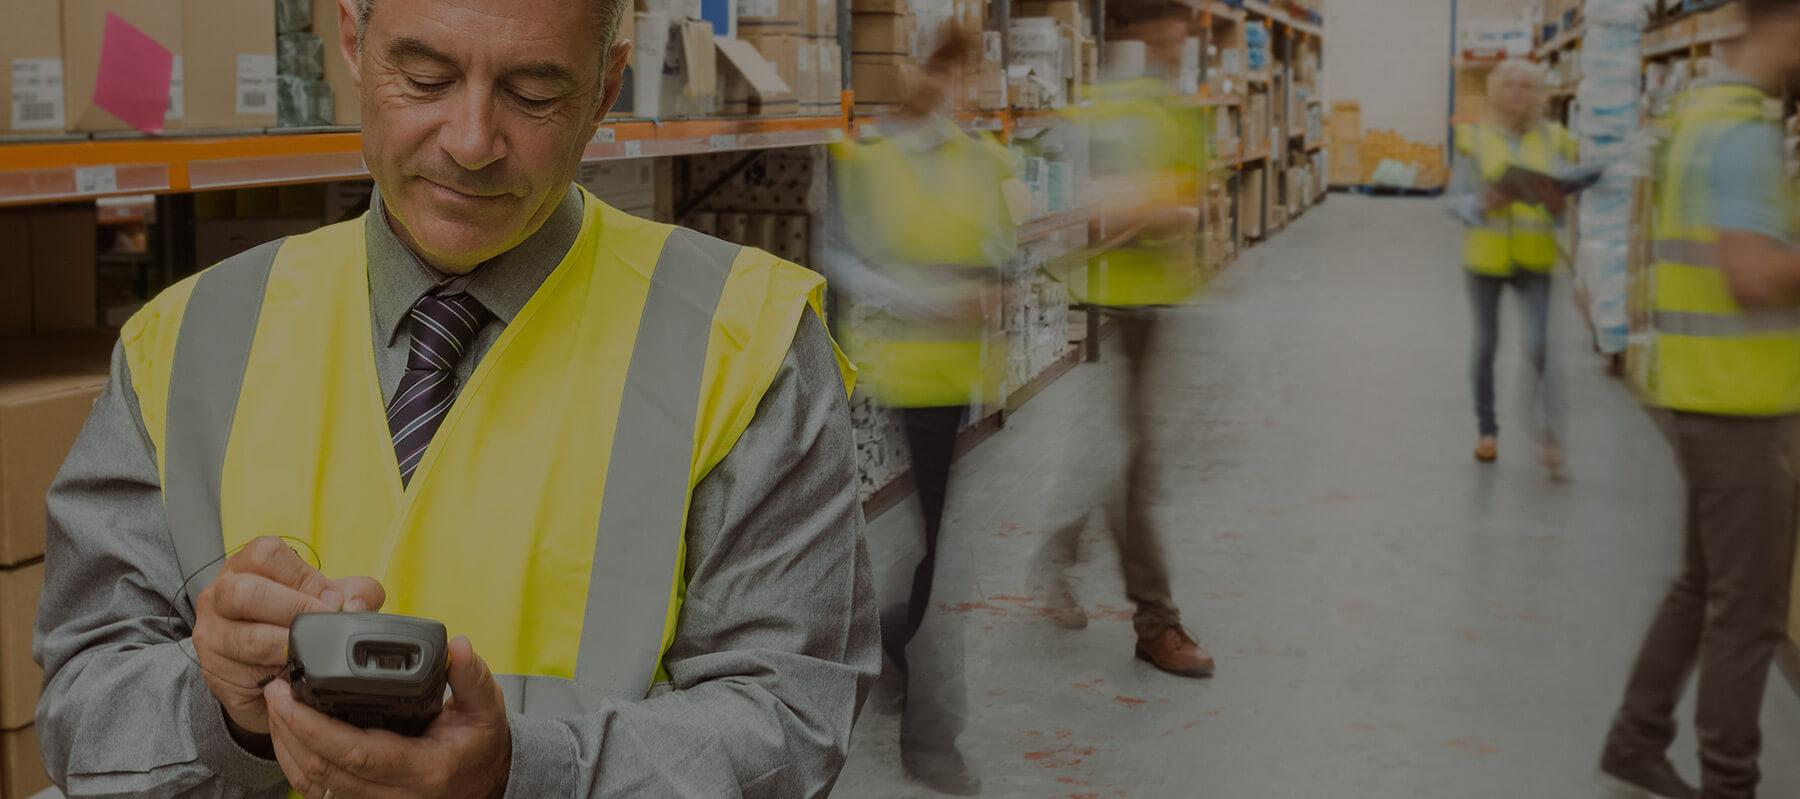 5-Critical-Inventory-Management-Best-Practices